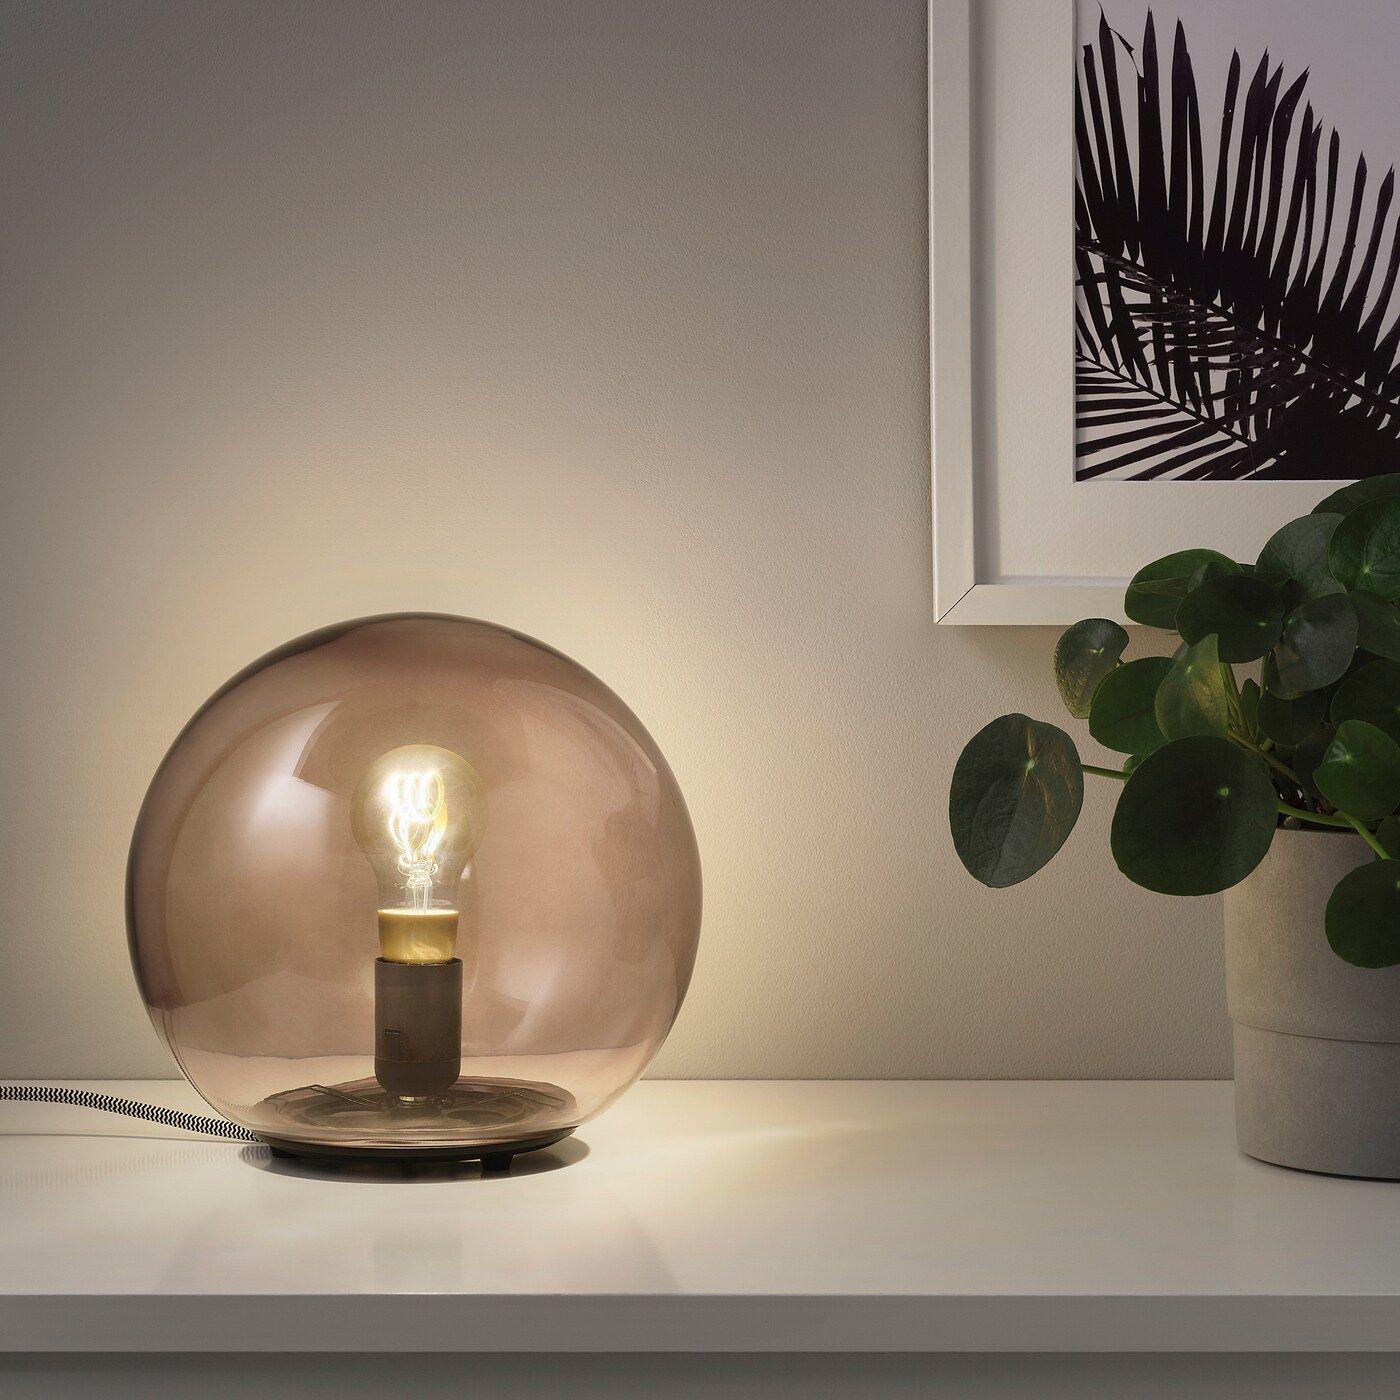 Tradfri Led Leuchtmittel E27 250 Lm Kabellos Dimmbar Behaglich